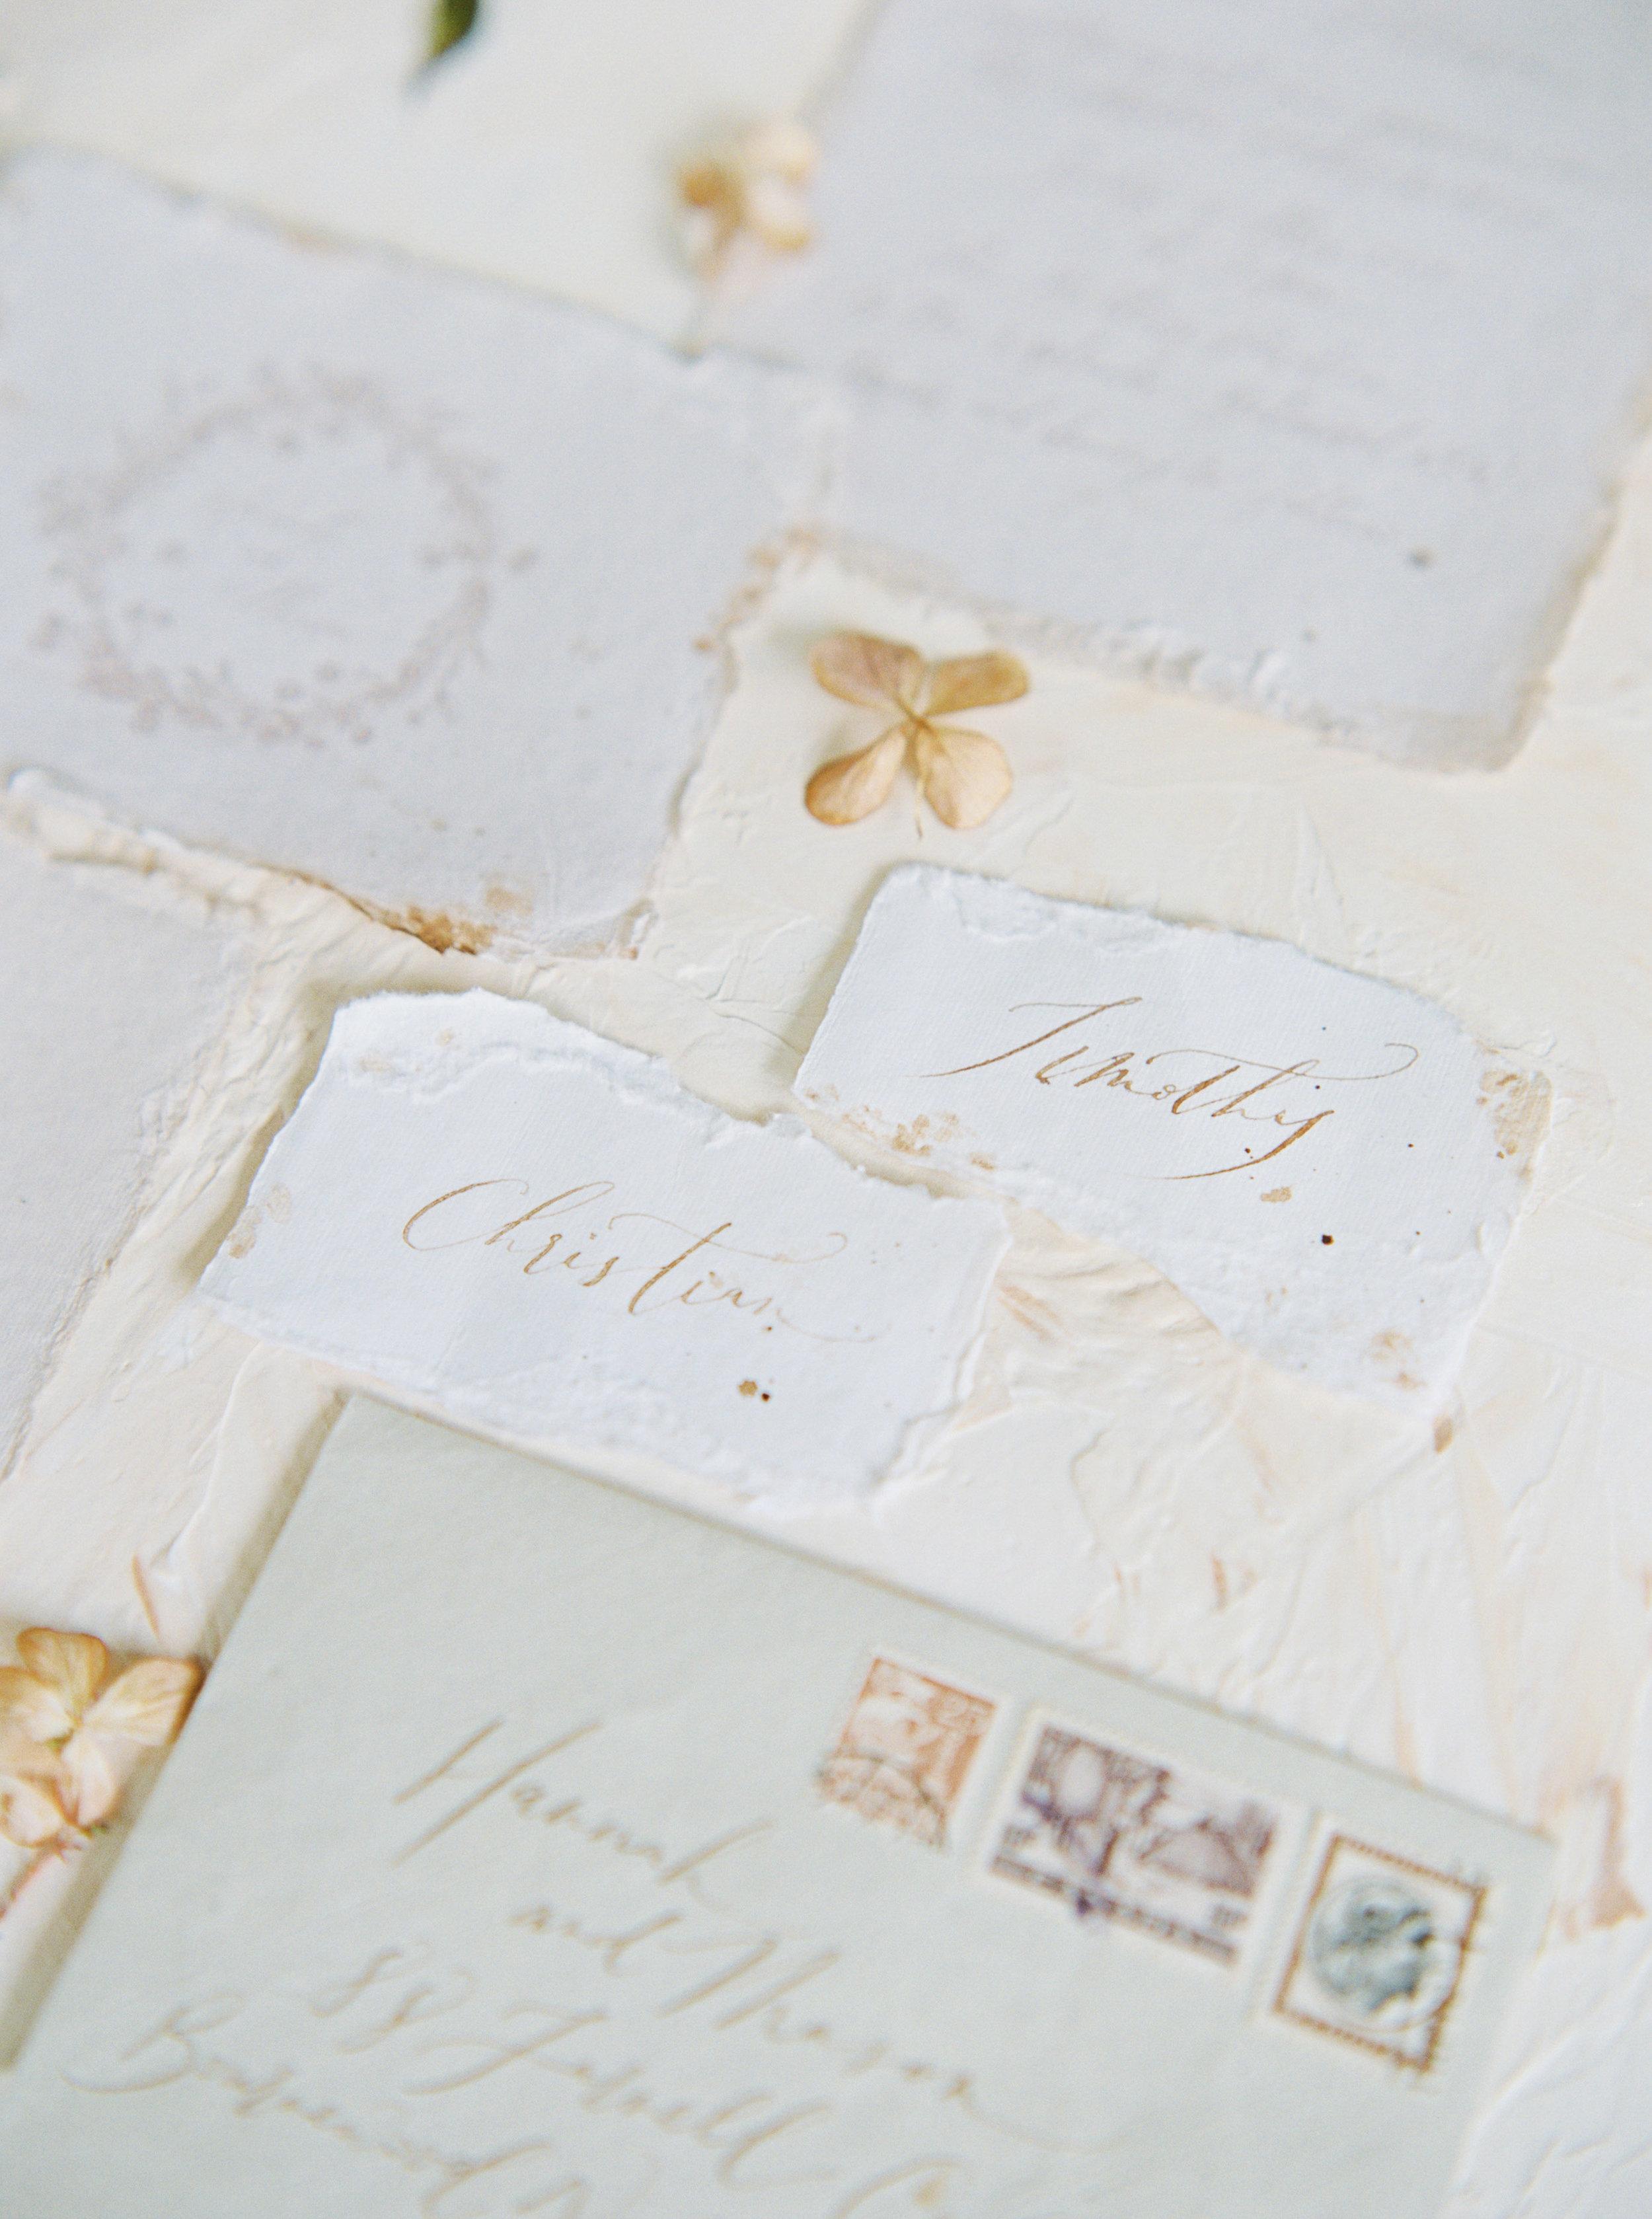 Copy of Handmade paper wedding invitation suit